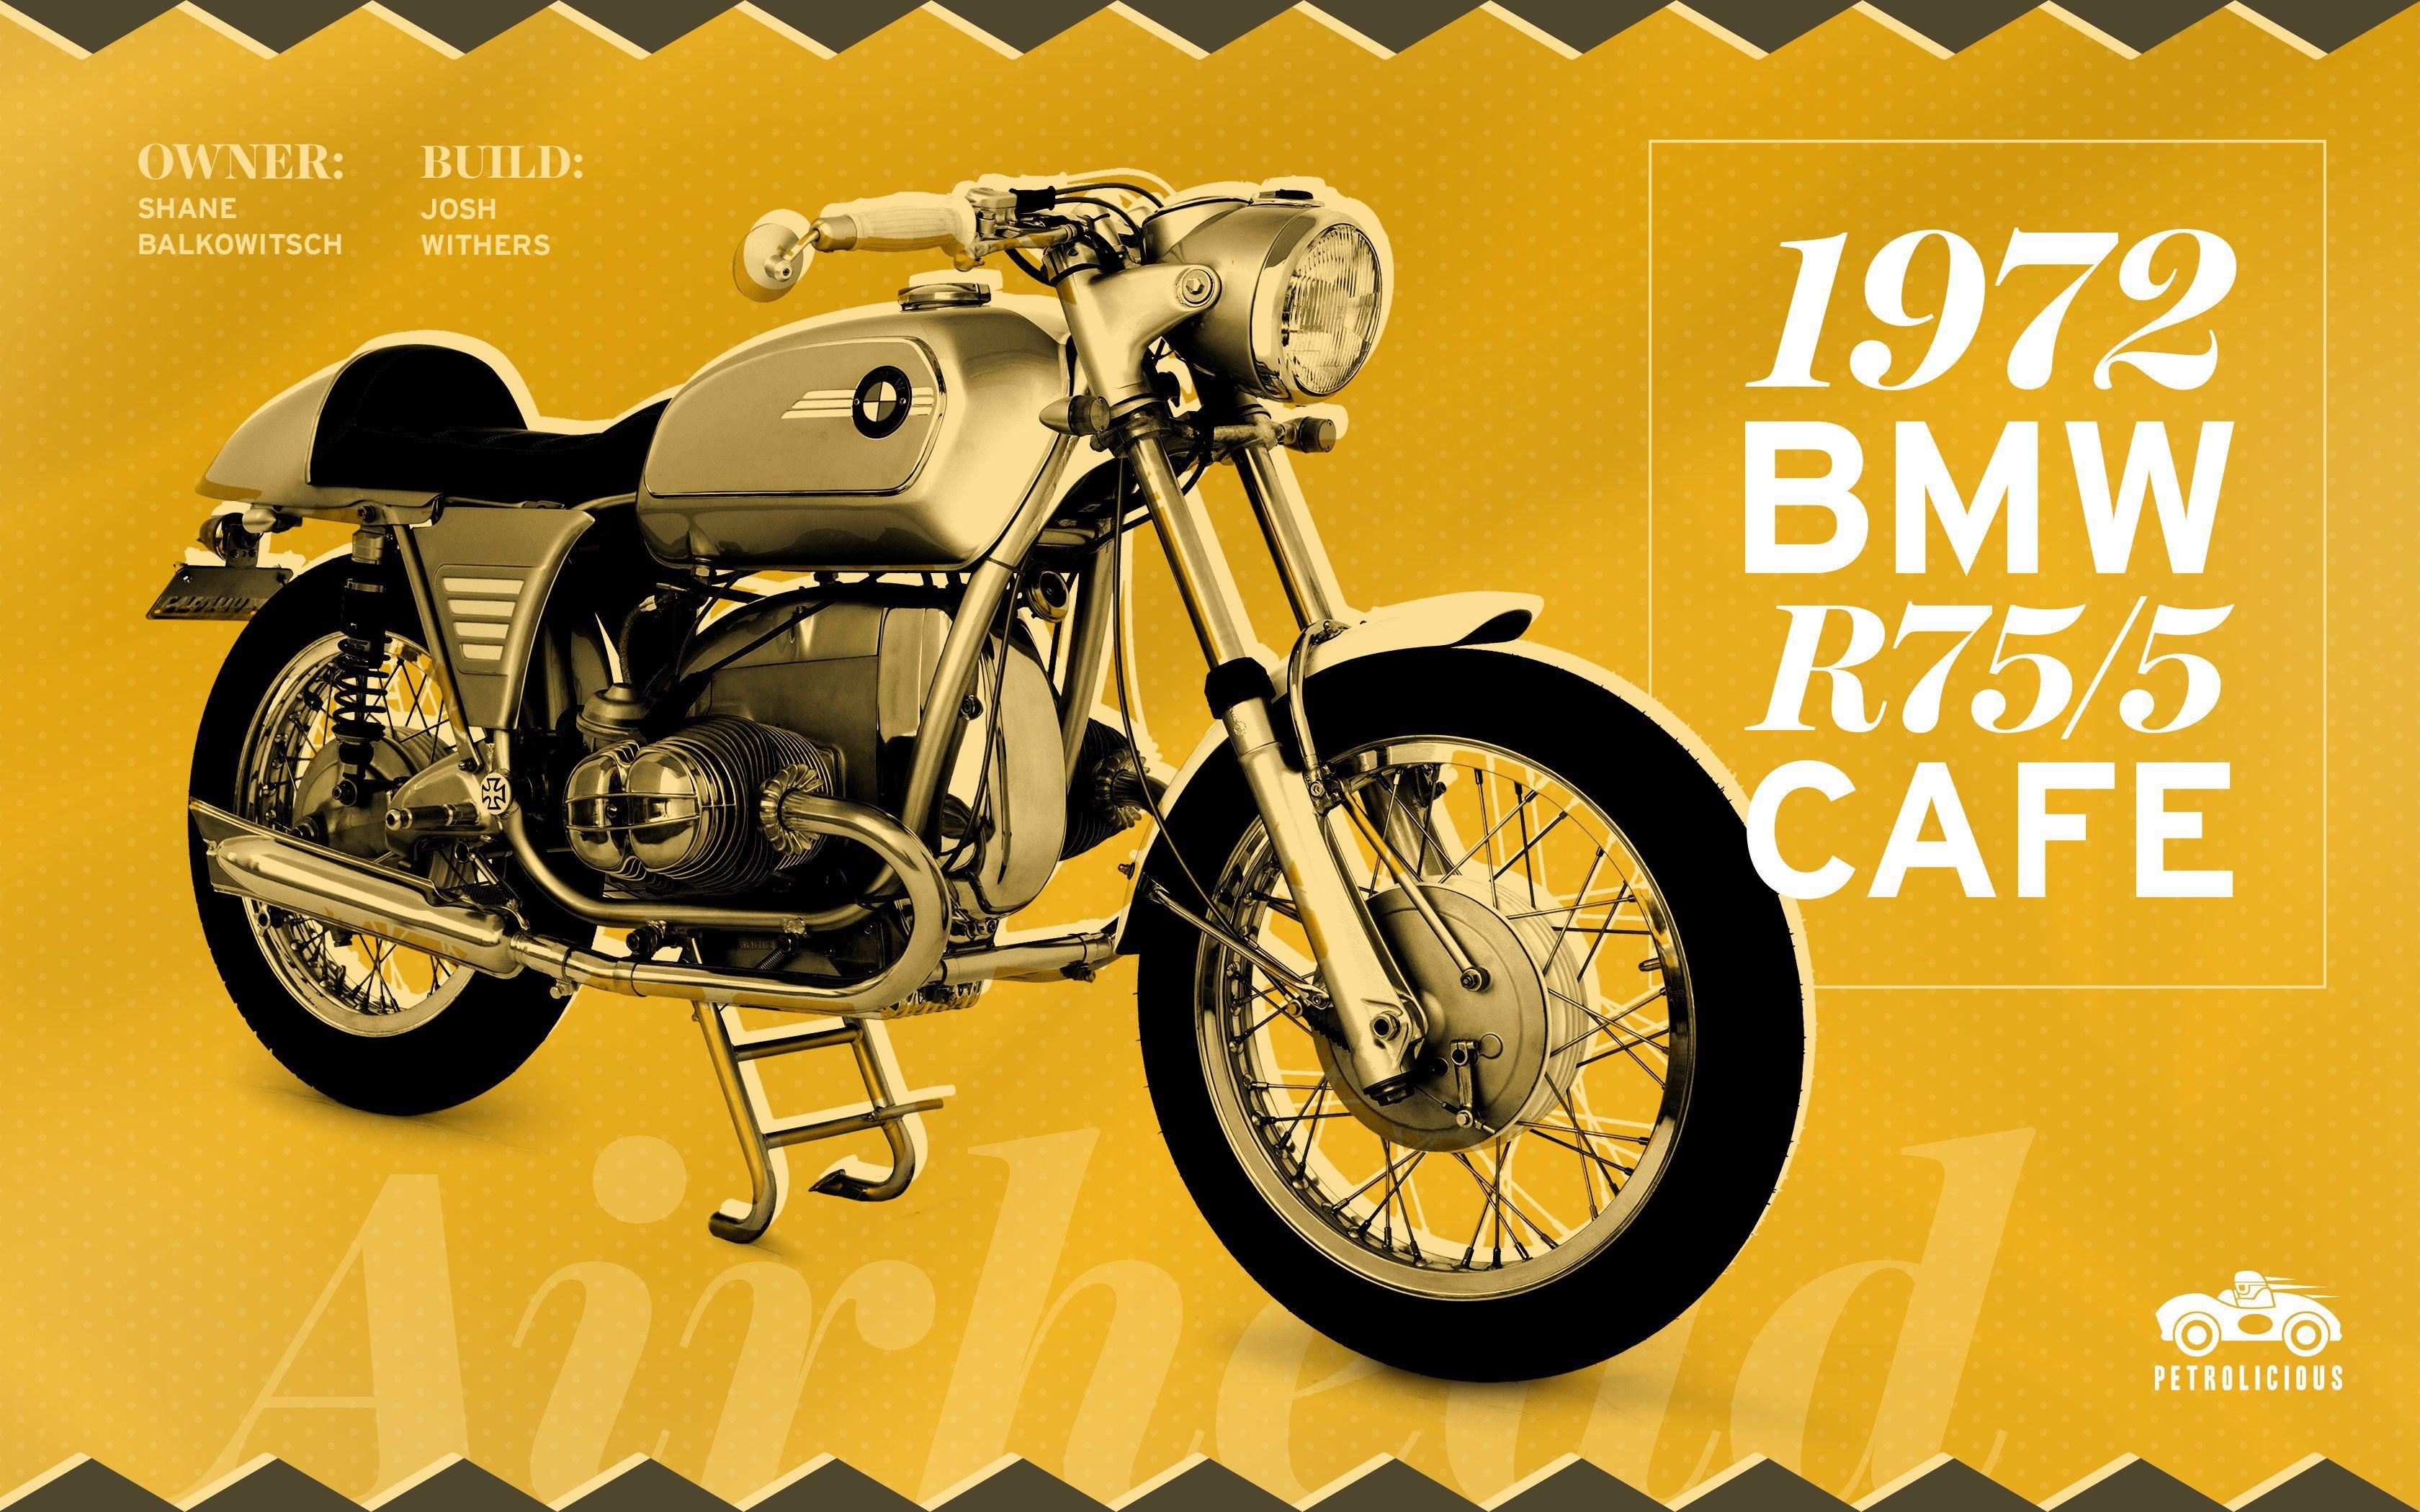 Vintage Motorcycle Wallpaper 1080p Free Download Mobil